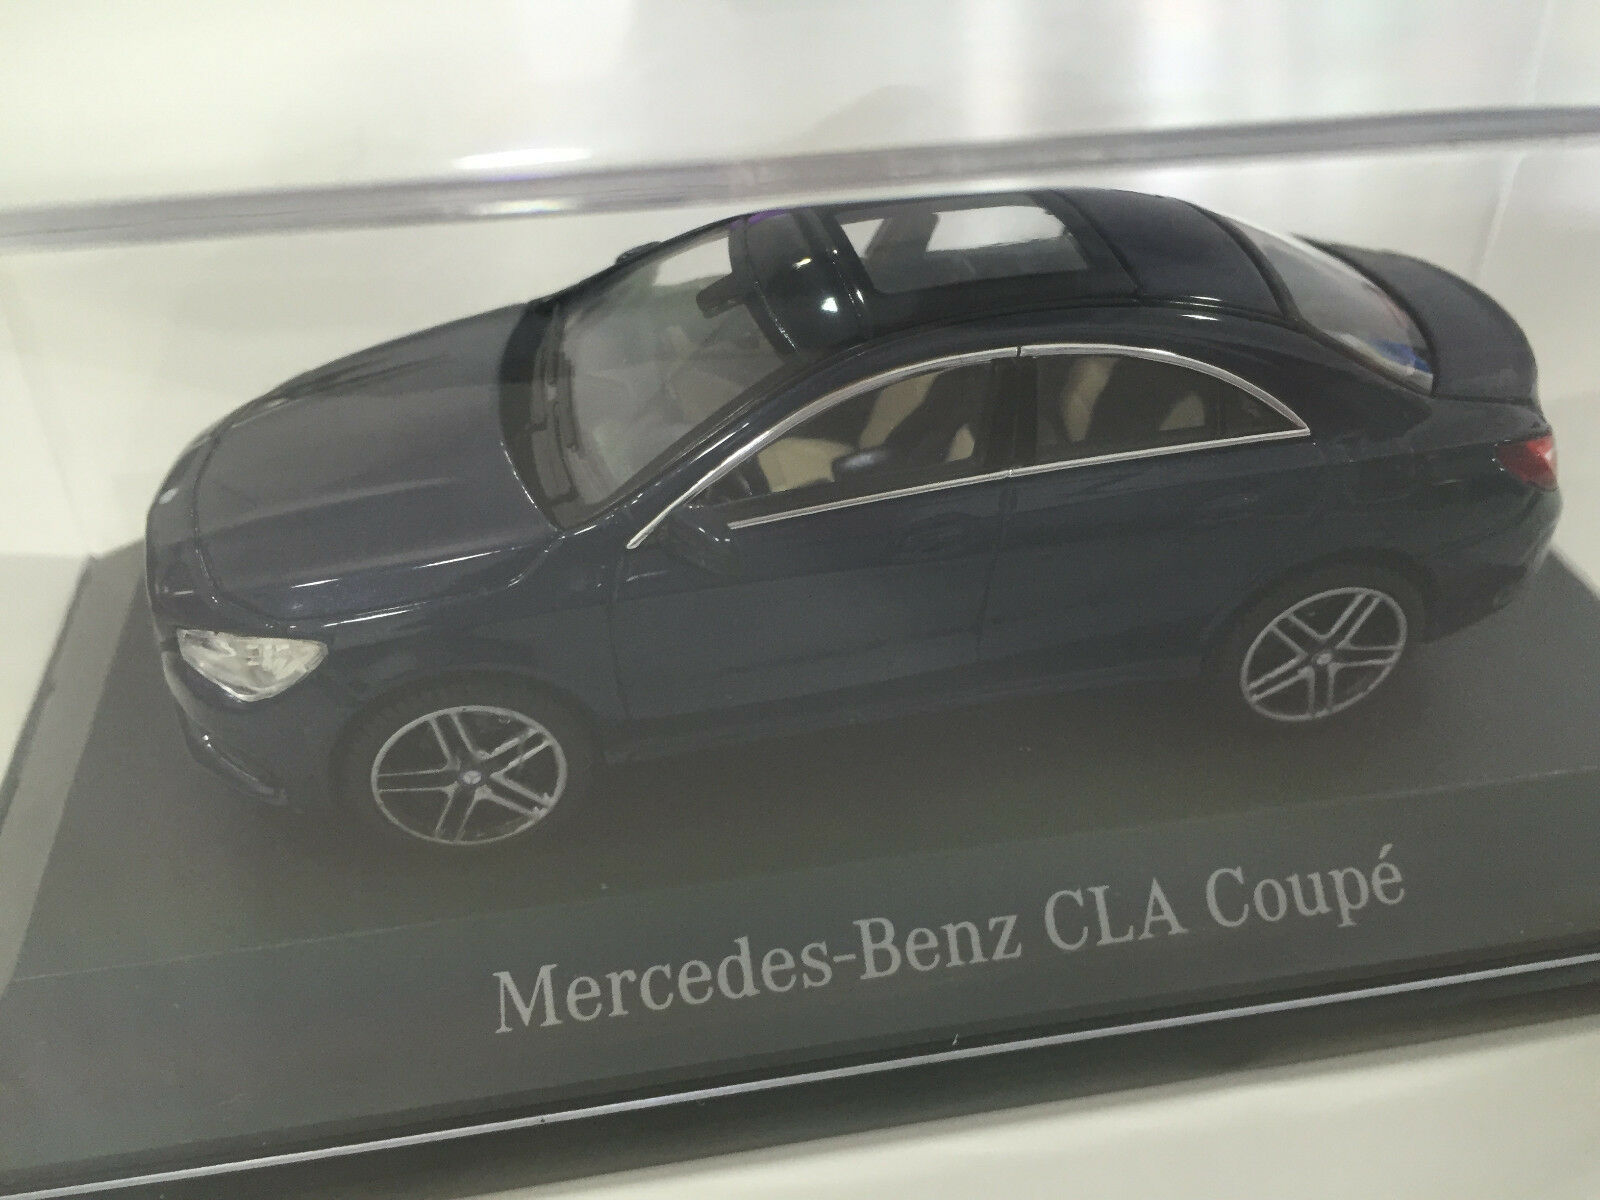 MERCEDES-BENZ CLA Coupé c117 Cavasitbleu 1 43